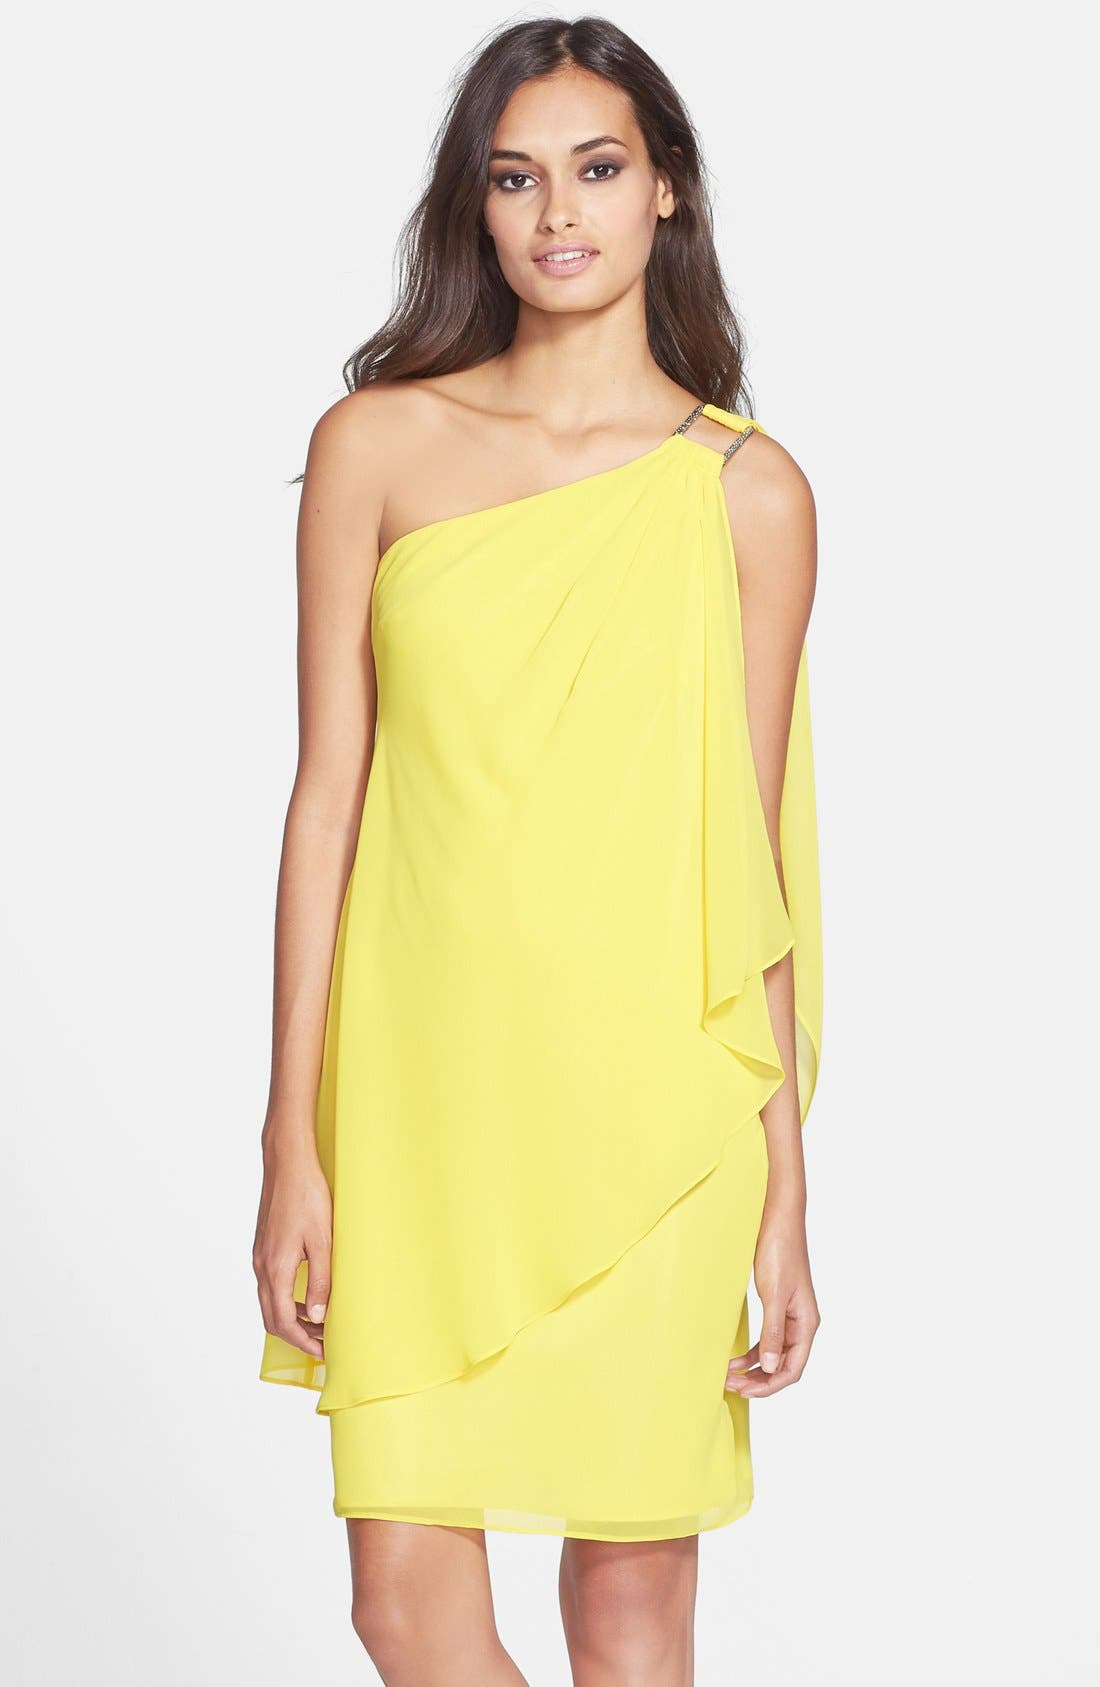 Alternate Image 1 Selected - Laundry by Shelli Segal One-Shoulder Drape Chiffon Dress